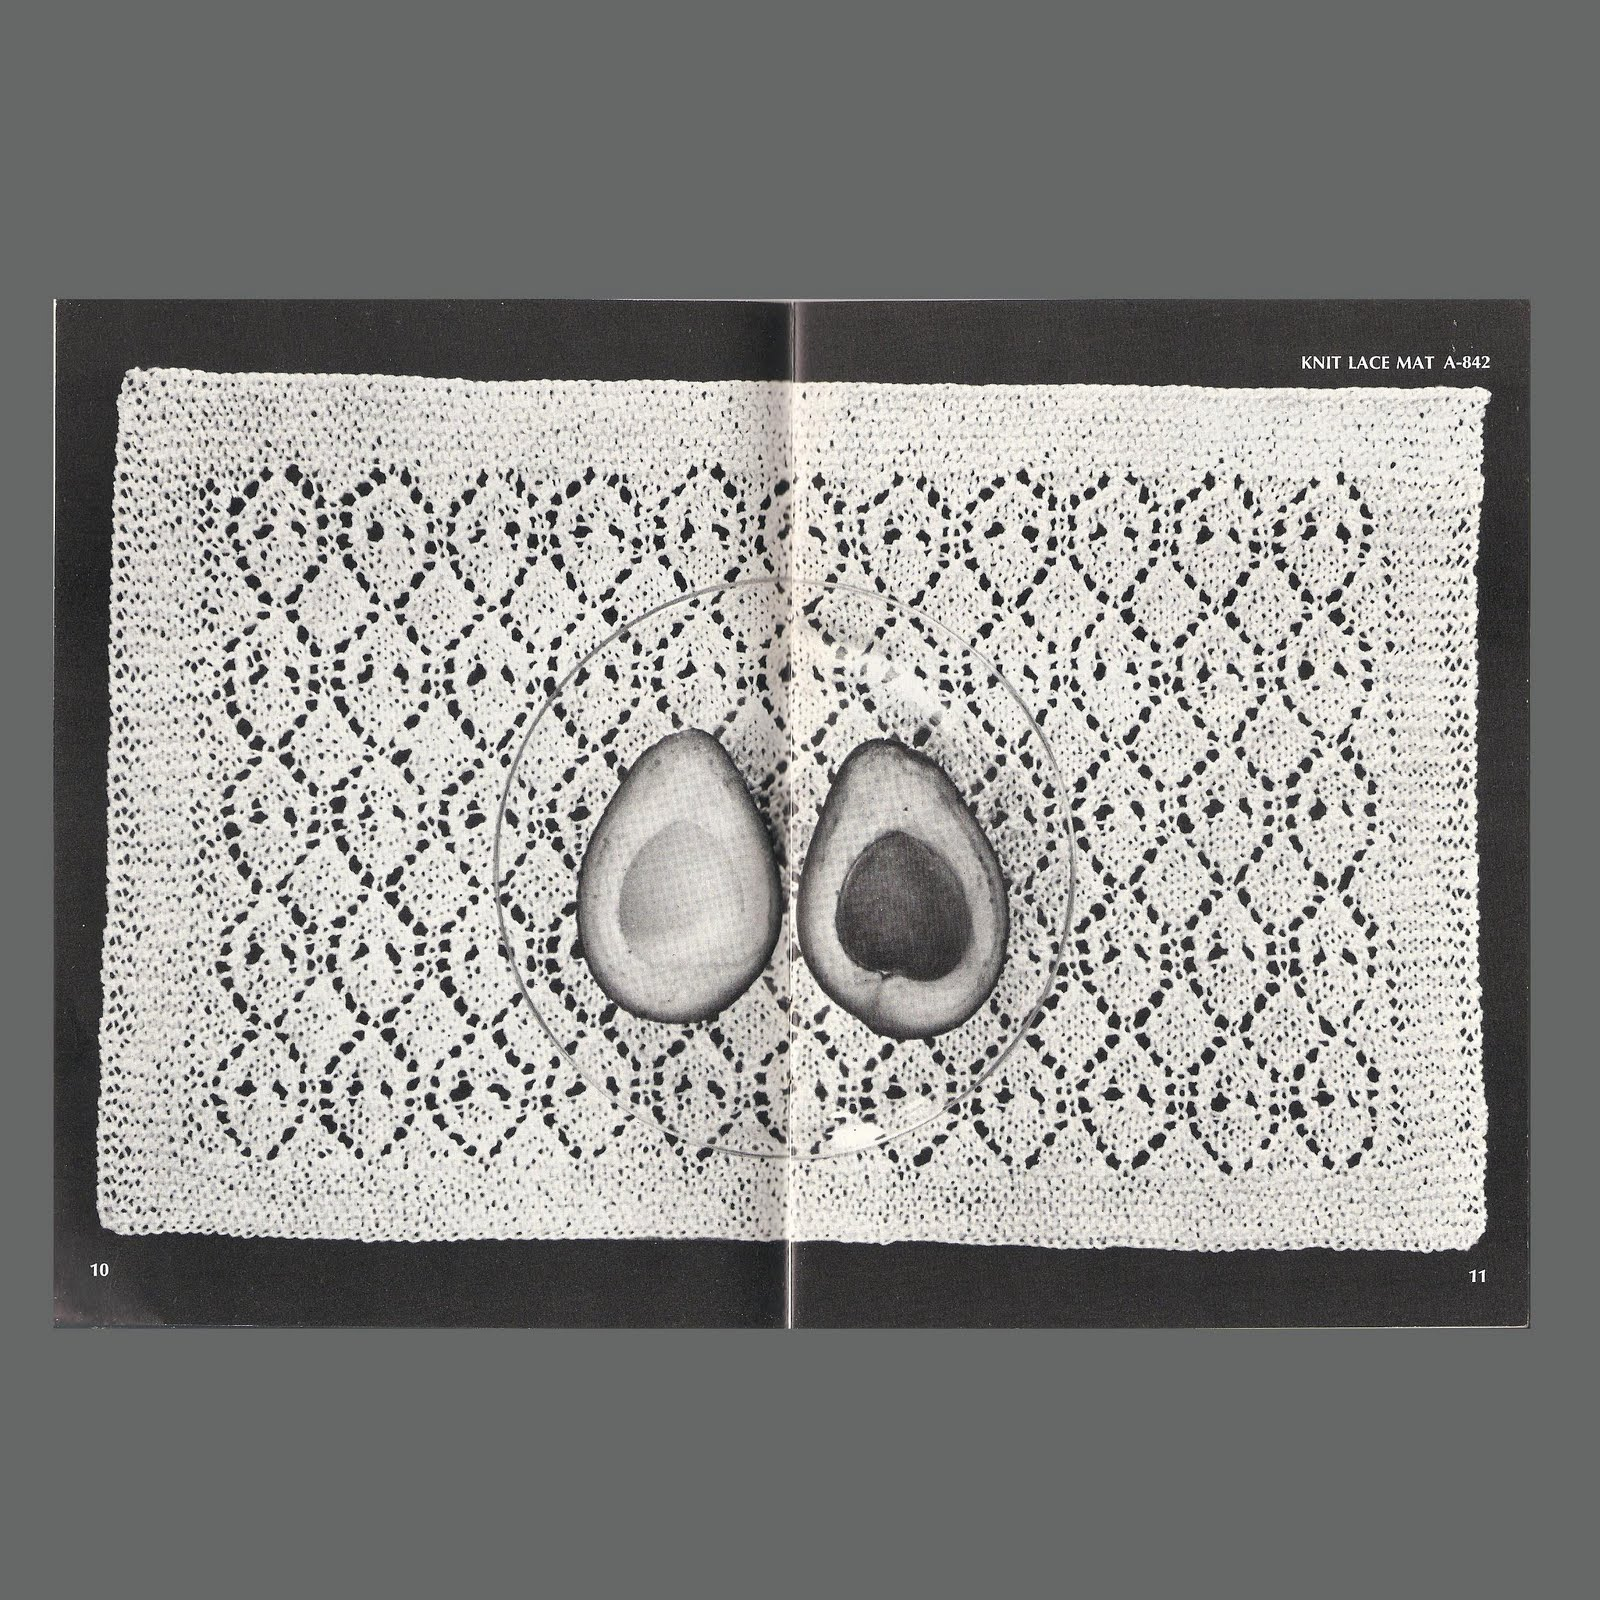 Vintage Knit Crochet Shop Talk Knit Or Crochet With Coats